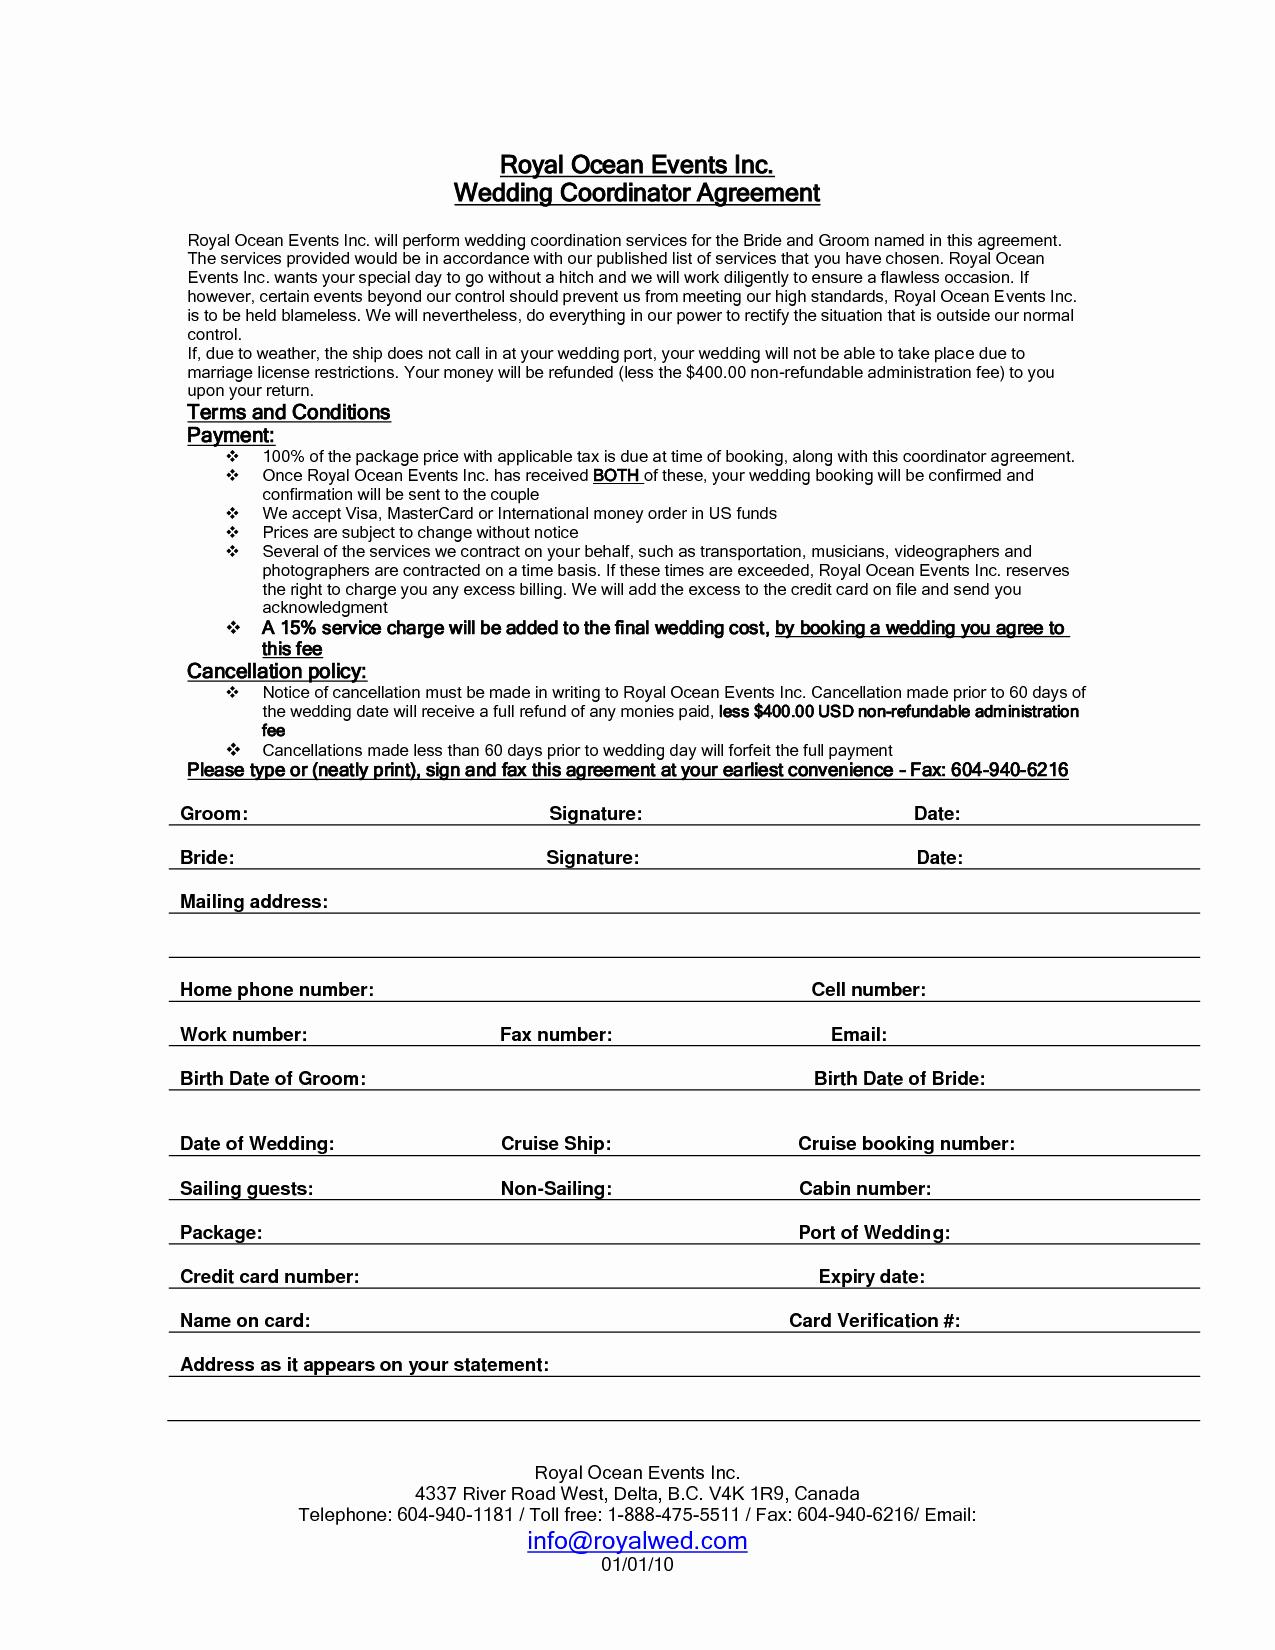 Wedding Planner Website Template Luxury Wedding Planner Contract Sample Templates